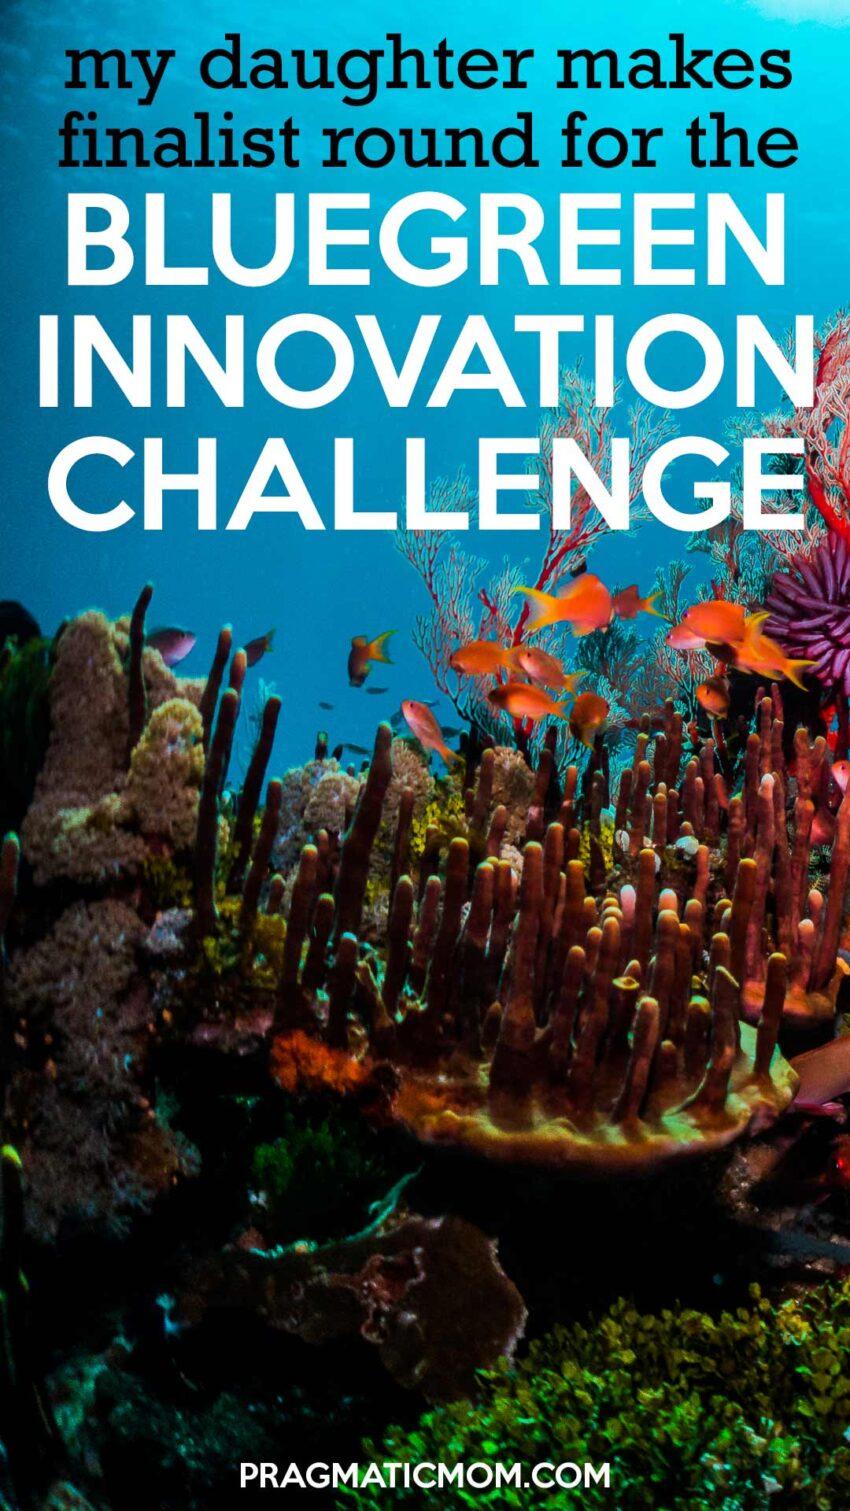 My Daughter Makes Finalist Round for BlueGreen Innovation Challenge